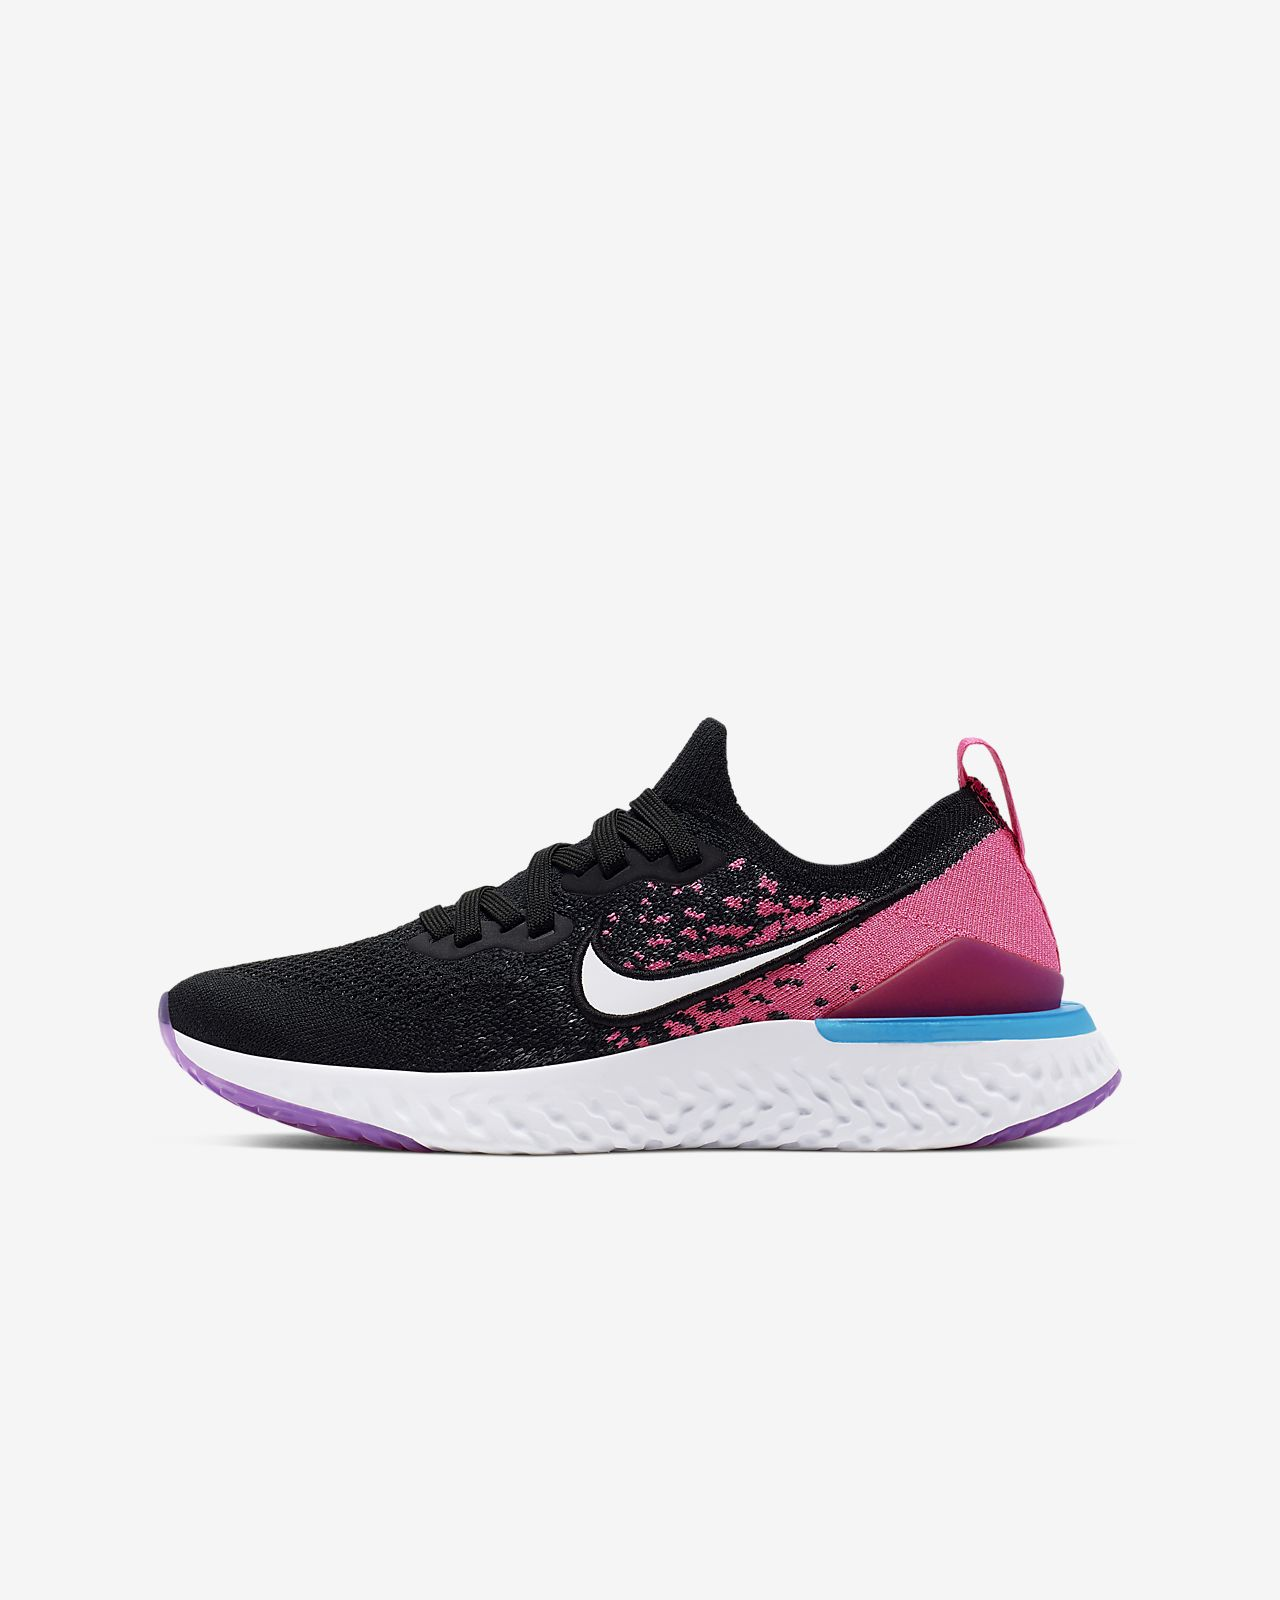 Sapatilhas de running Nike Epic React Flyknit 2 Júnior